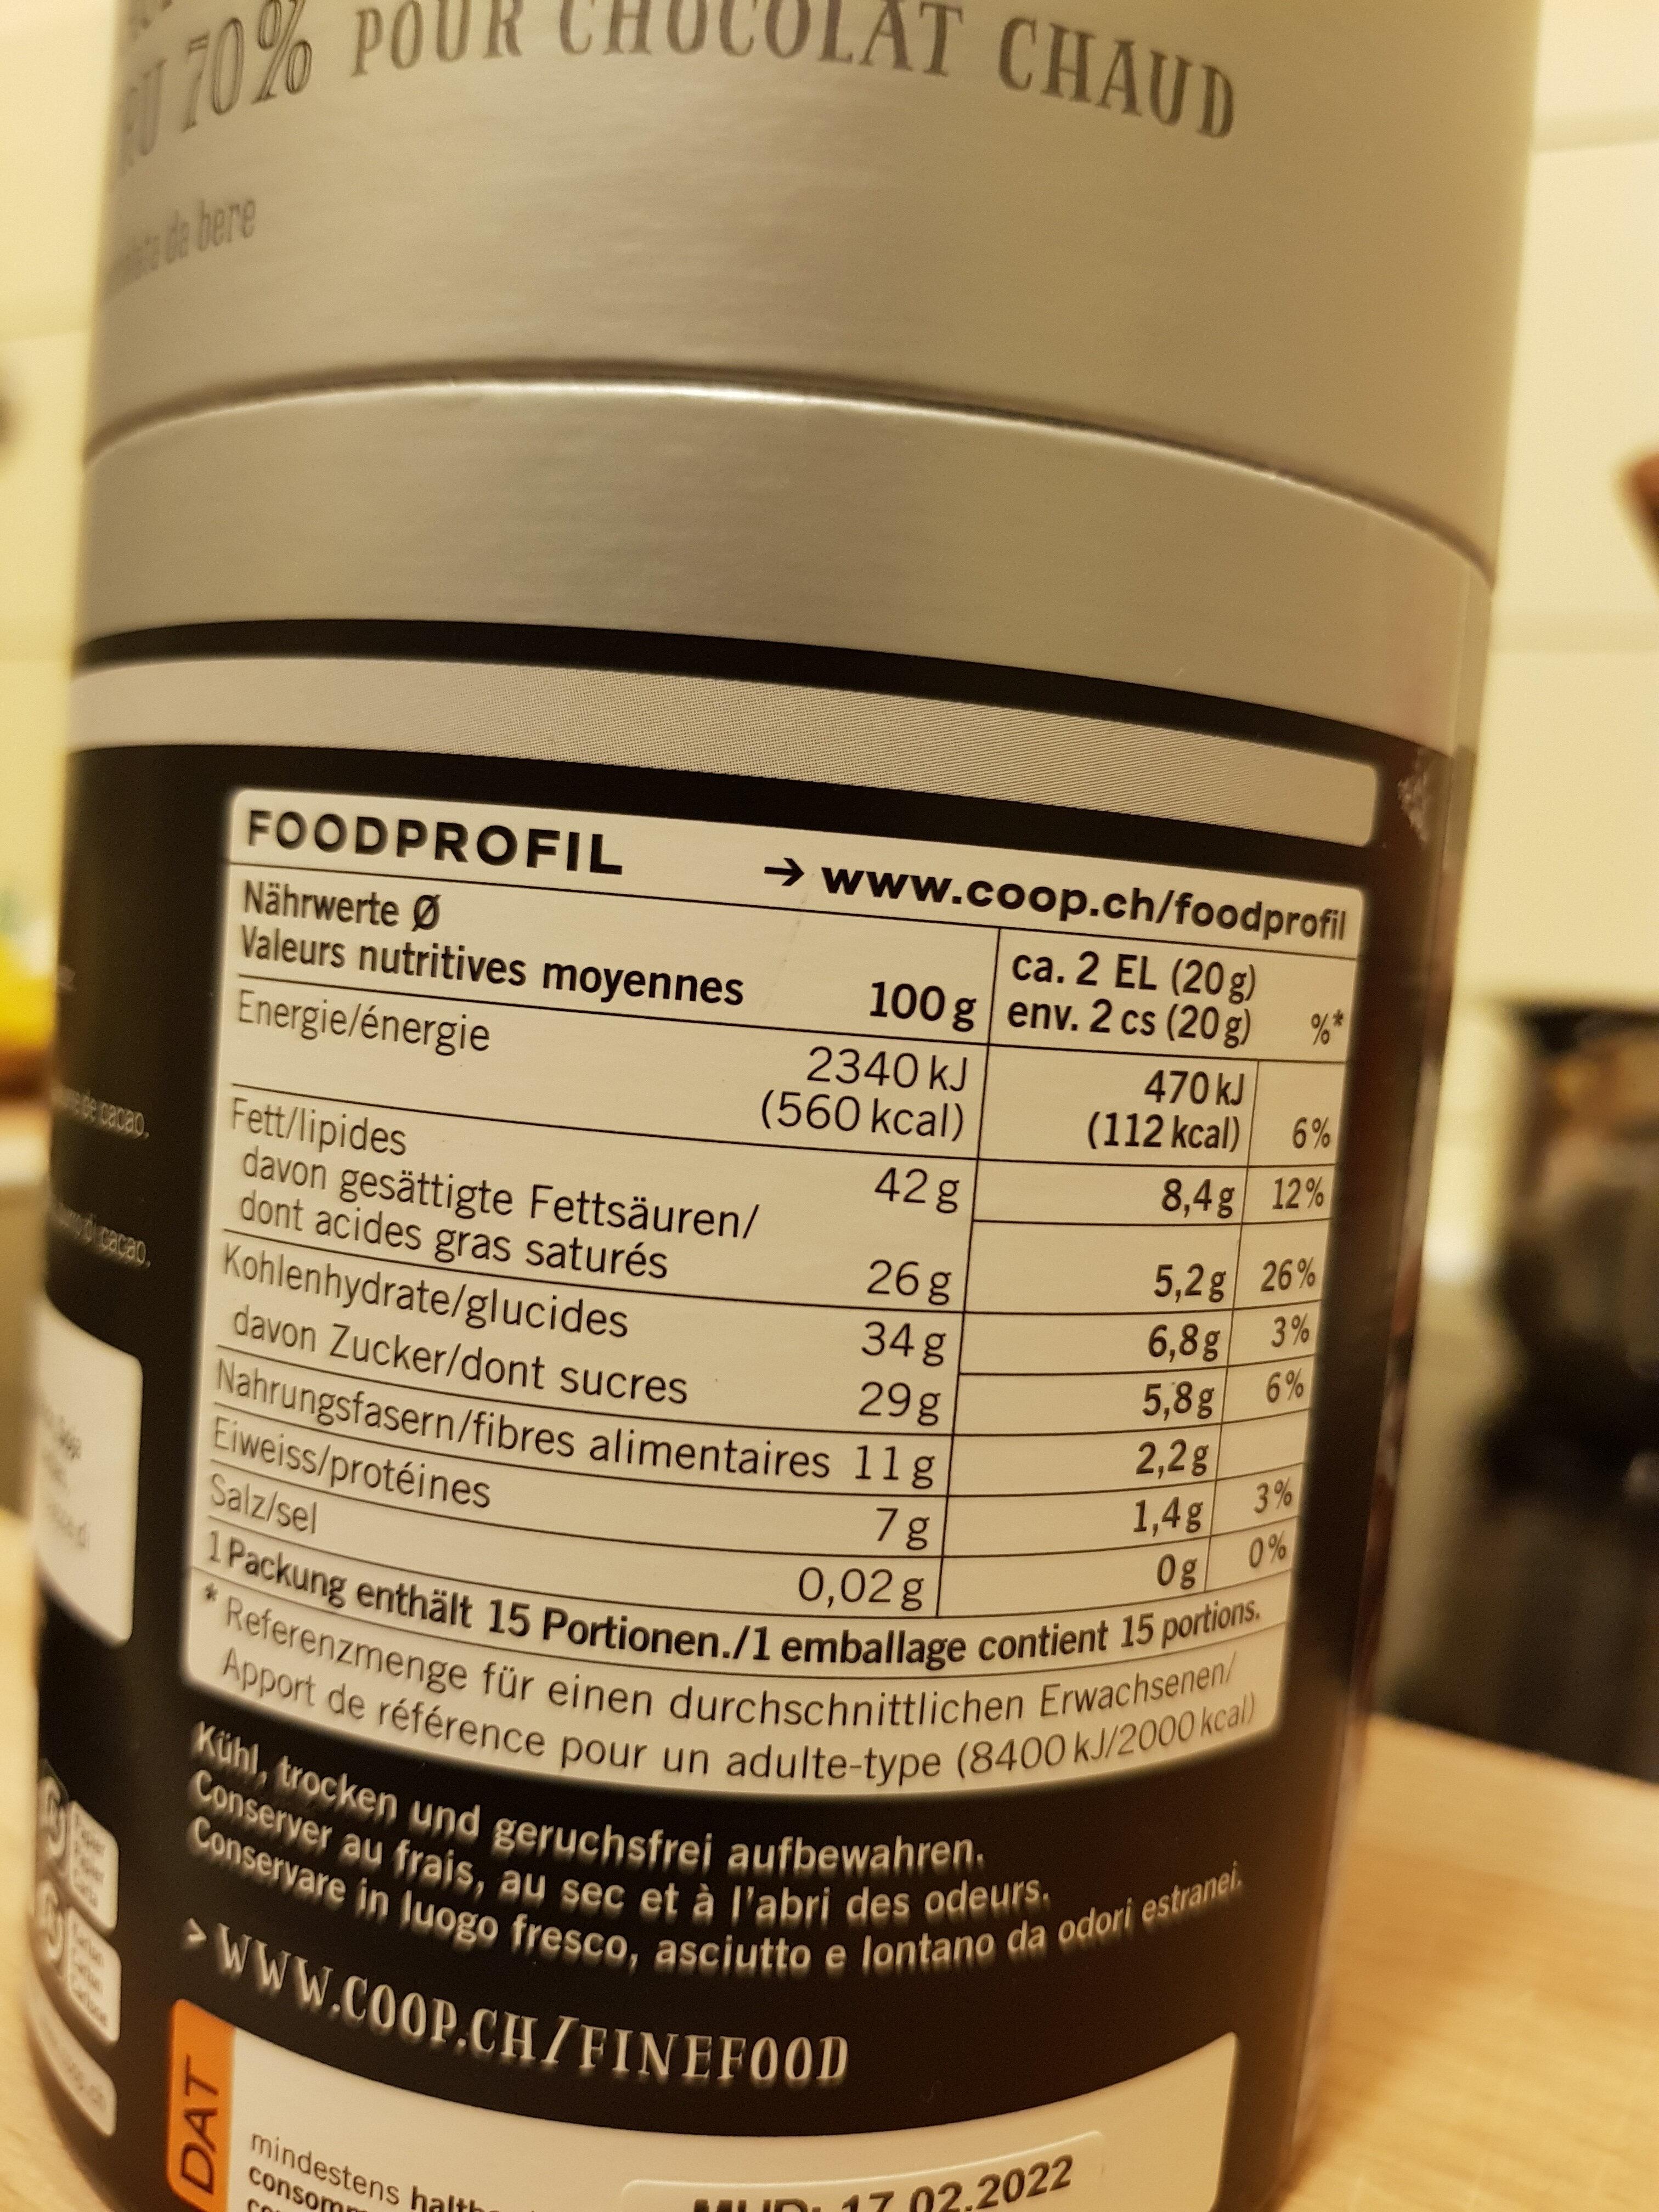 Perles dw Chocolat Cacao Nacional Ecuador Grand Cru 70^ - Informations nutritionnelles - fr